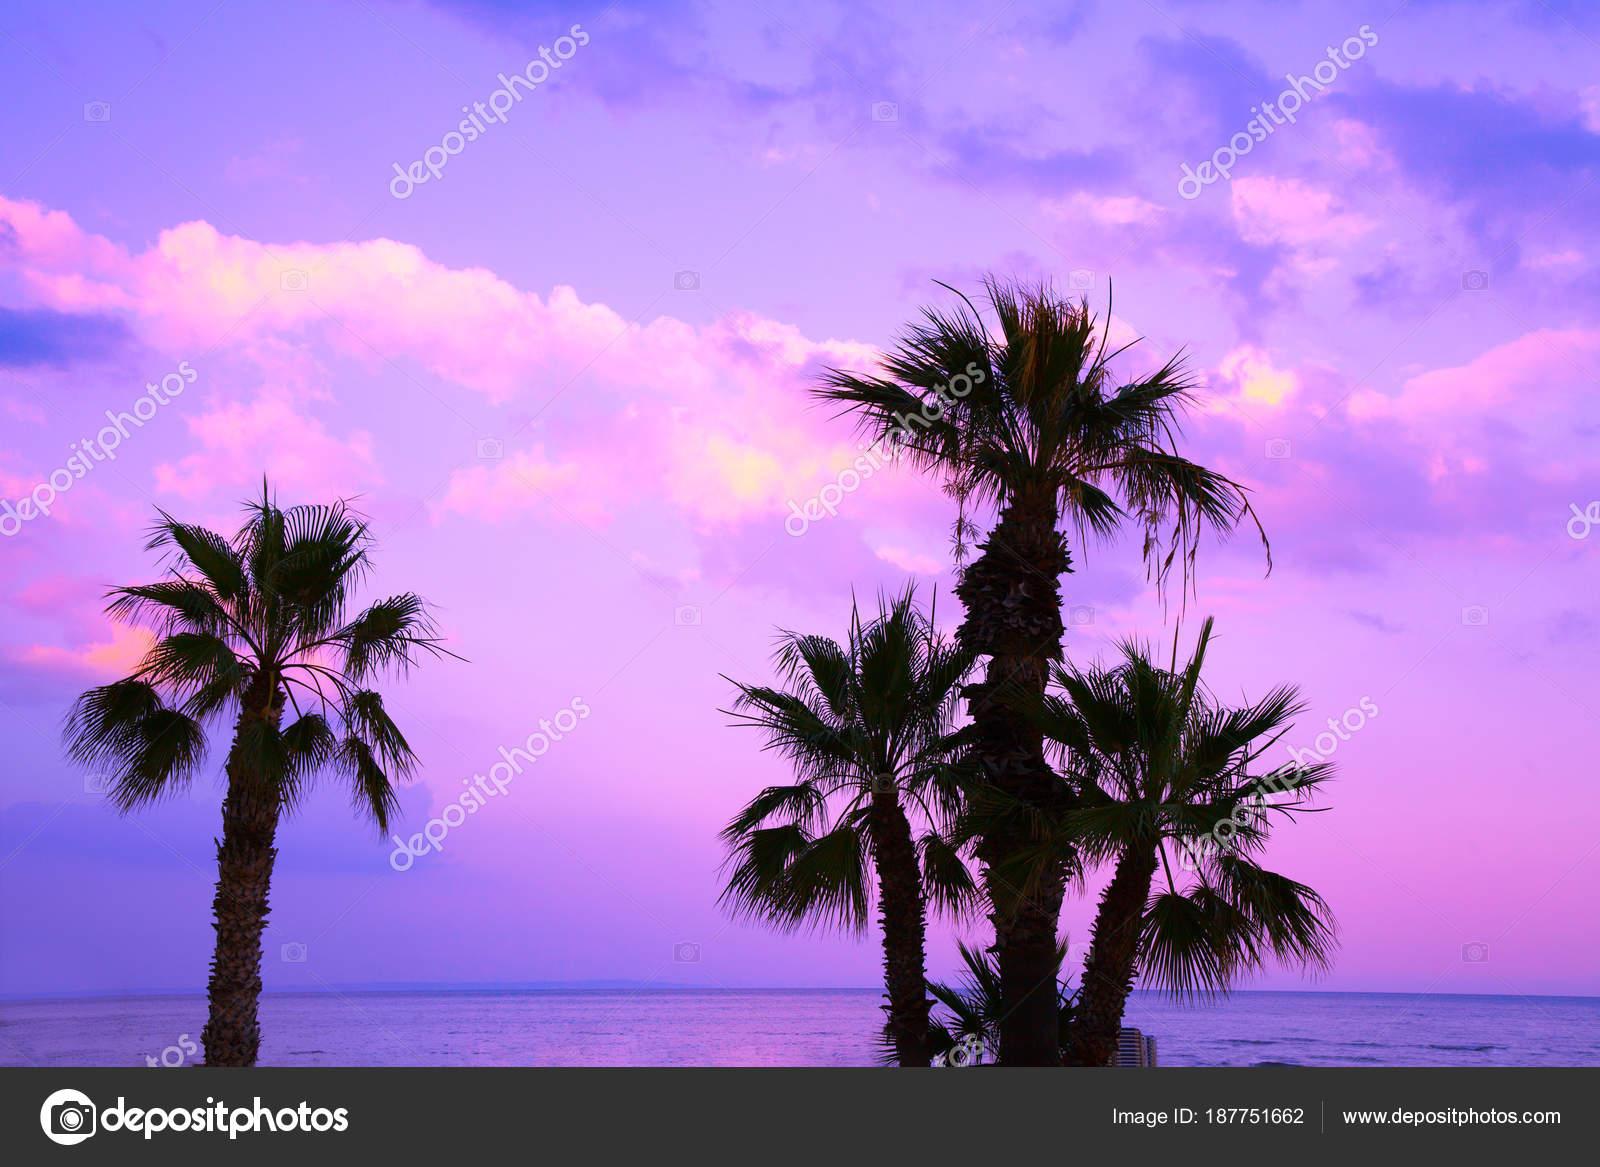 Purple Sunset With Palm Trees Palm Trees Purple Sunset Sky Tropical Evening Landscape Beautiful Nature Stock Photo C Vvvita 187751662